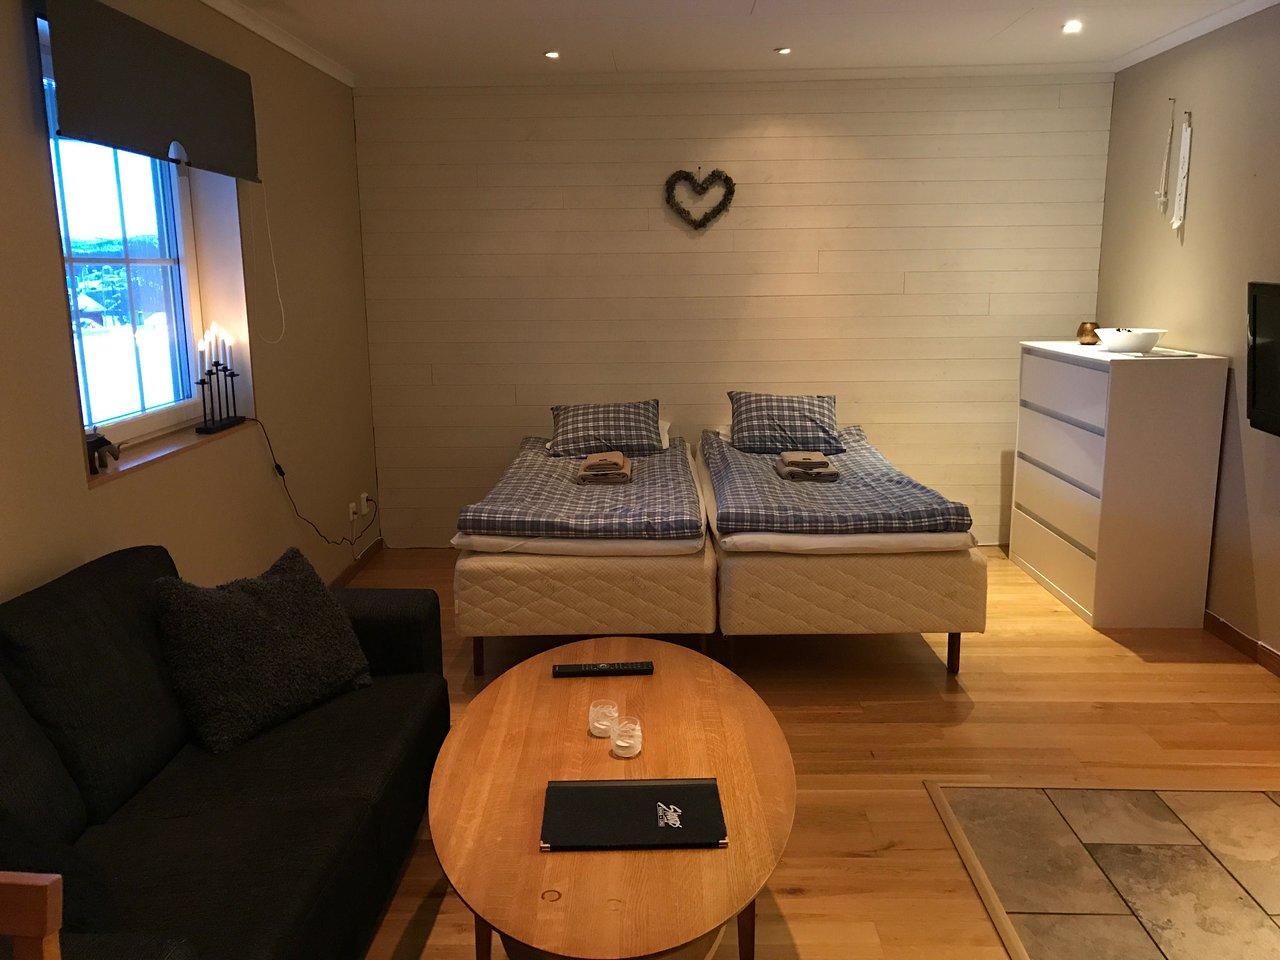 Skoogs Krog Och Logi Prices Guest House Reviews Funasdalen